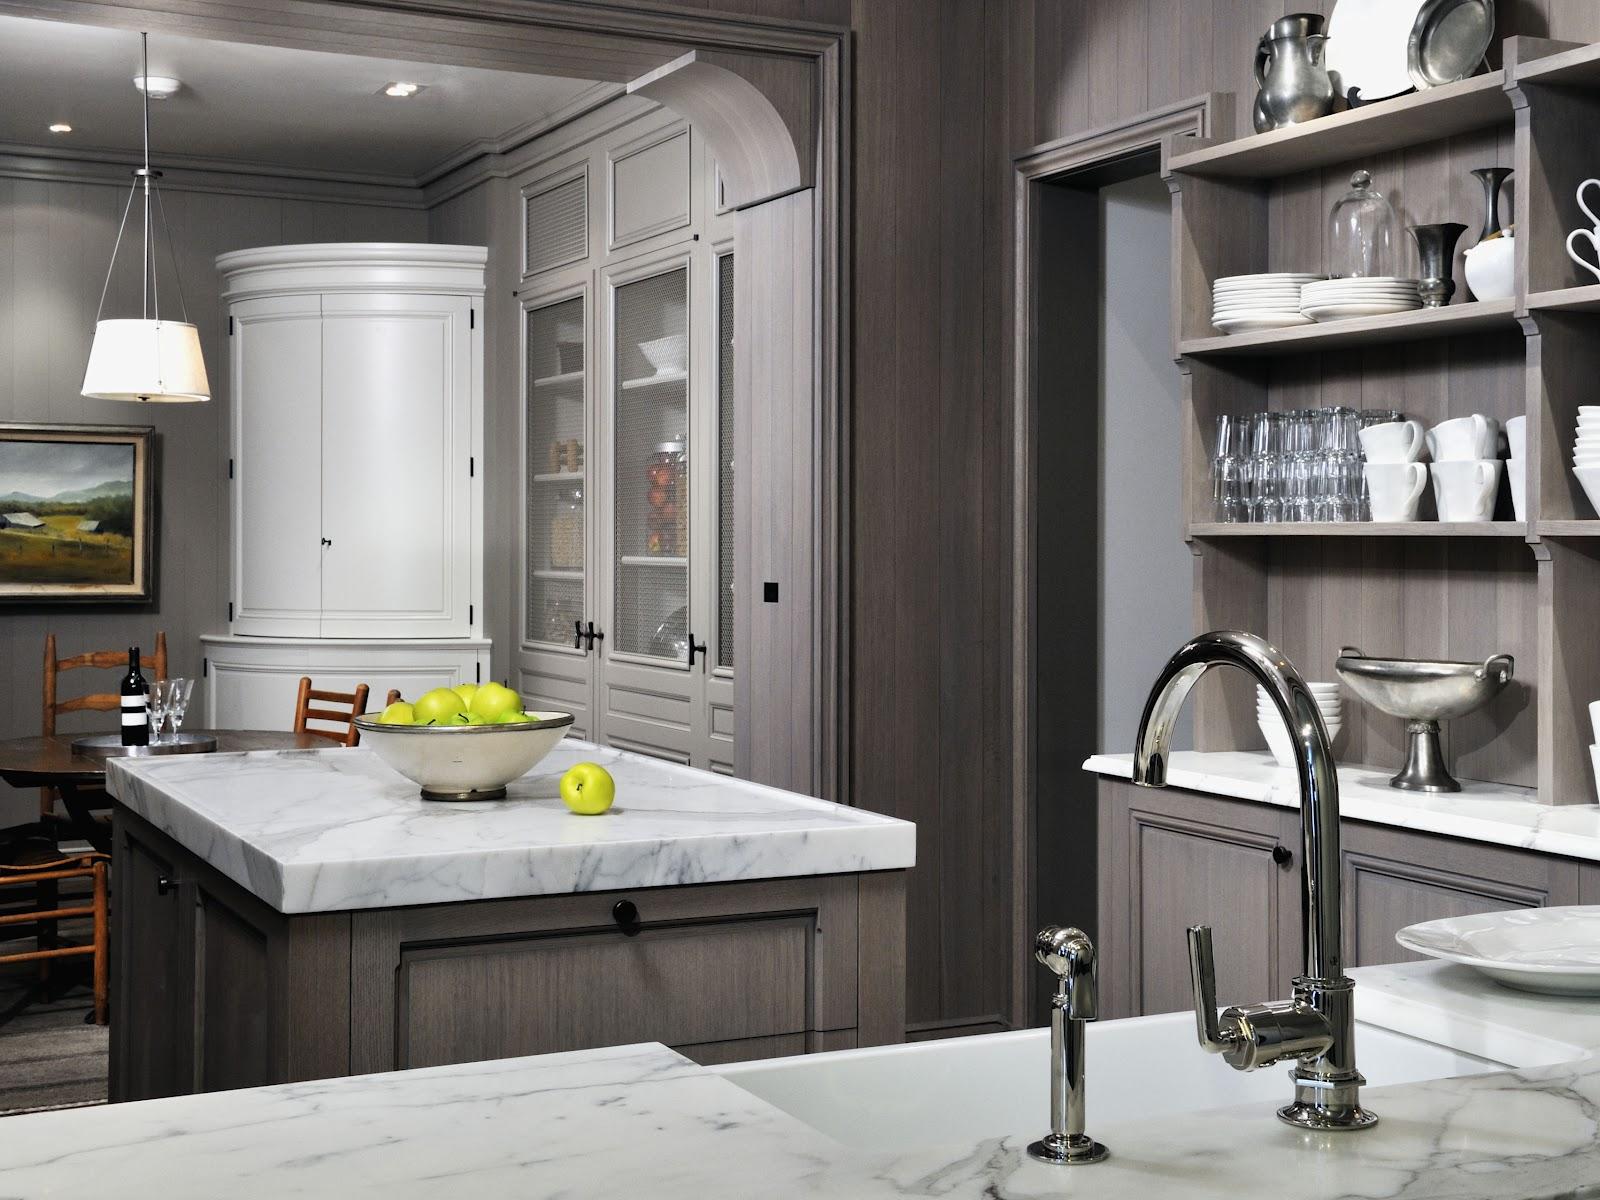 Elegant Vintage Grey Painting Kitchen Countertops Ideas (View 6 of 10)